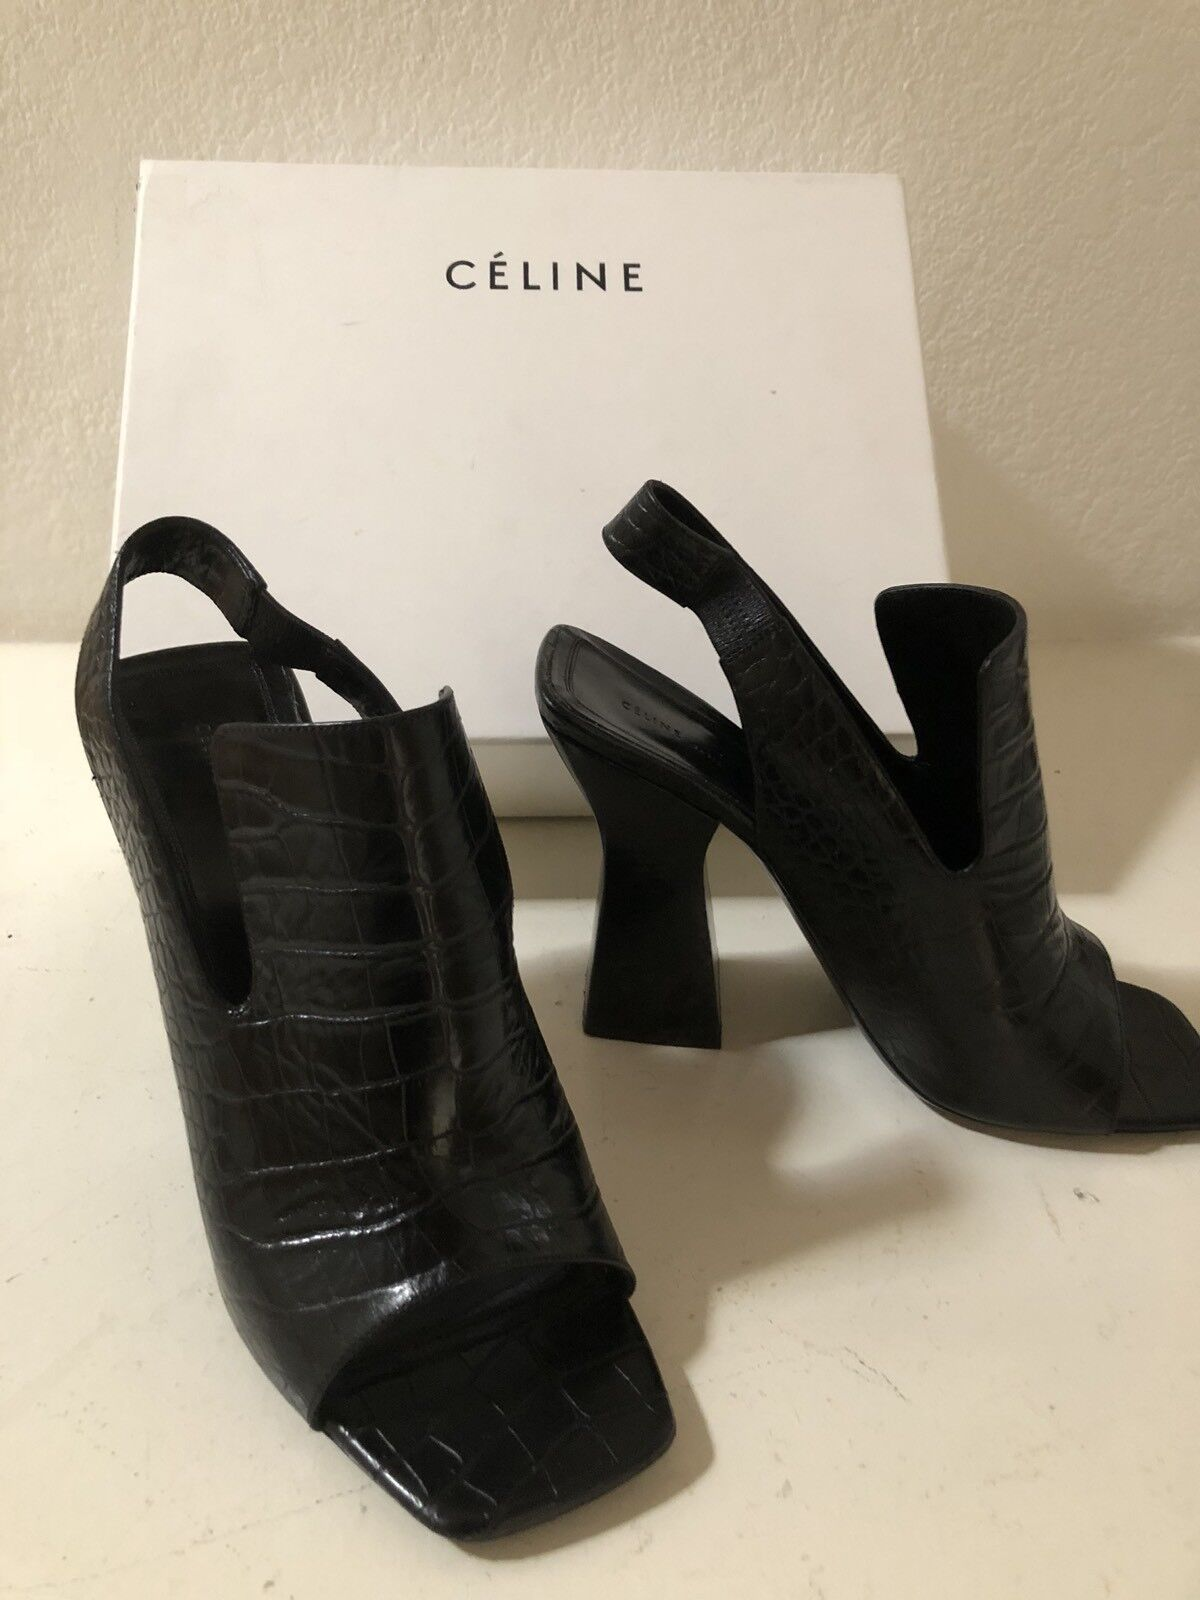 Celine ,black ,high heel,exelent condition, slightly used $250 ,was $920